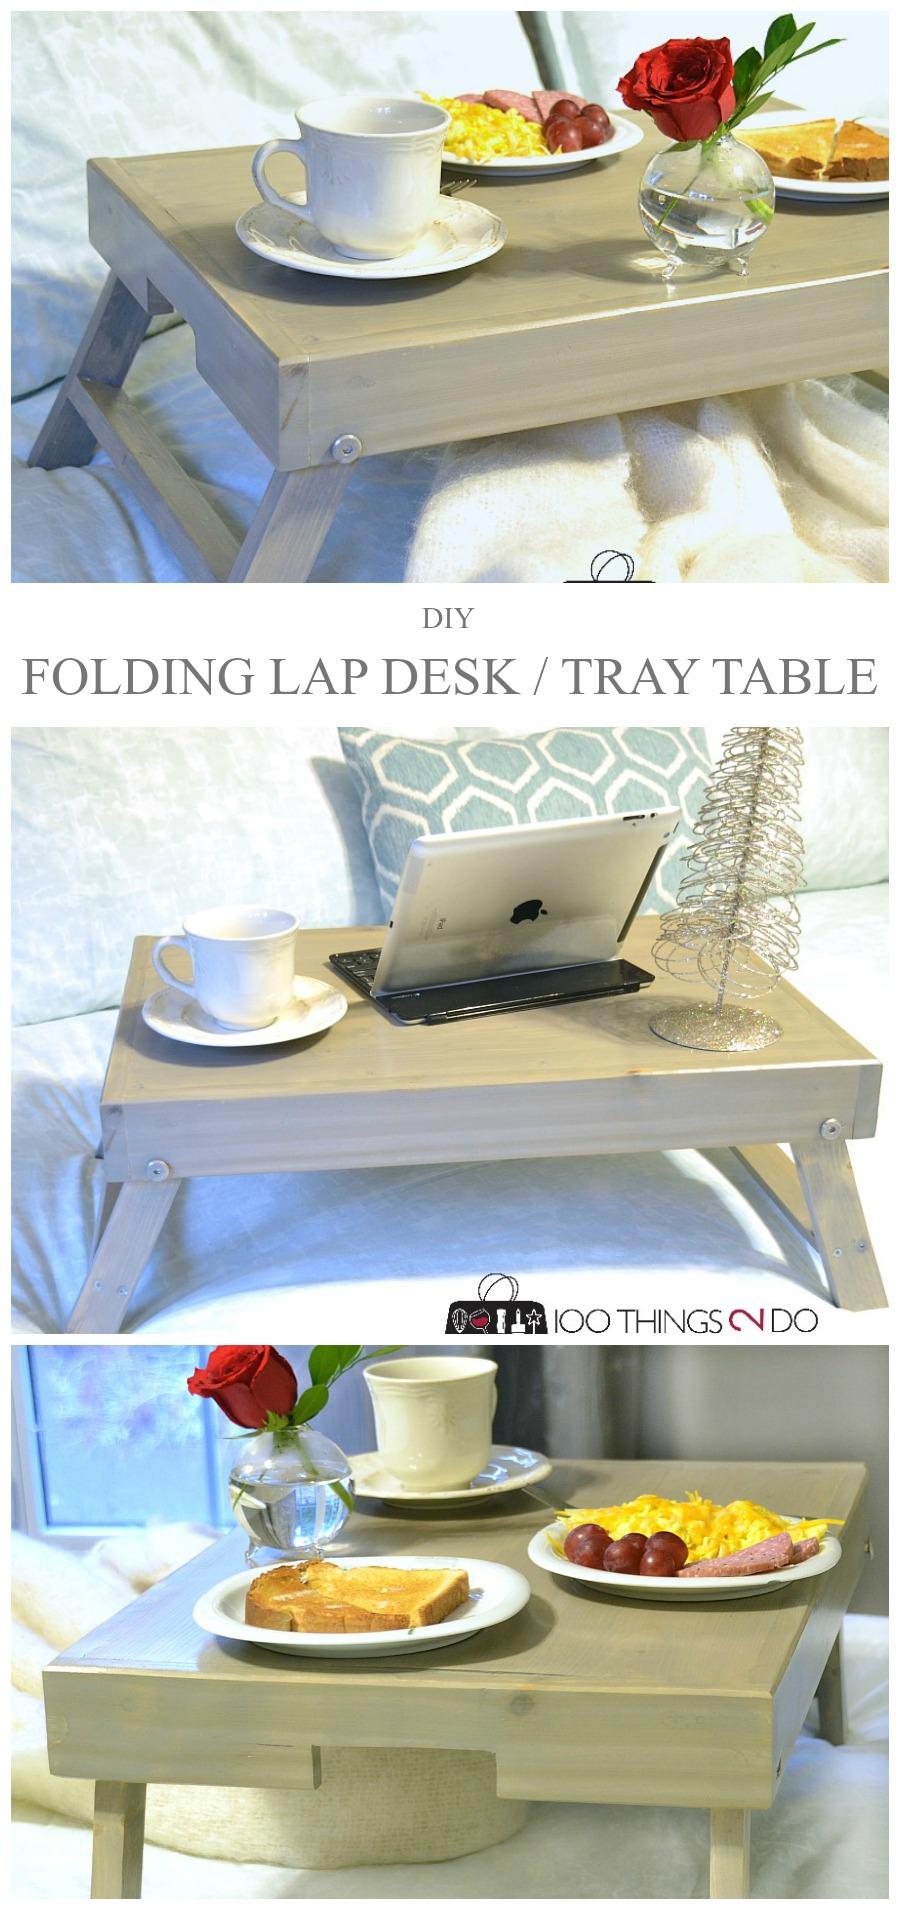 DIY folding lap desk, DIY folding breakfast tray, lap desk, breakfast tray, breakfast in bed